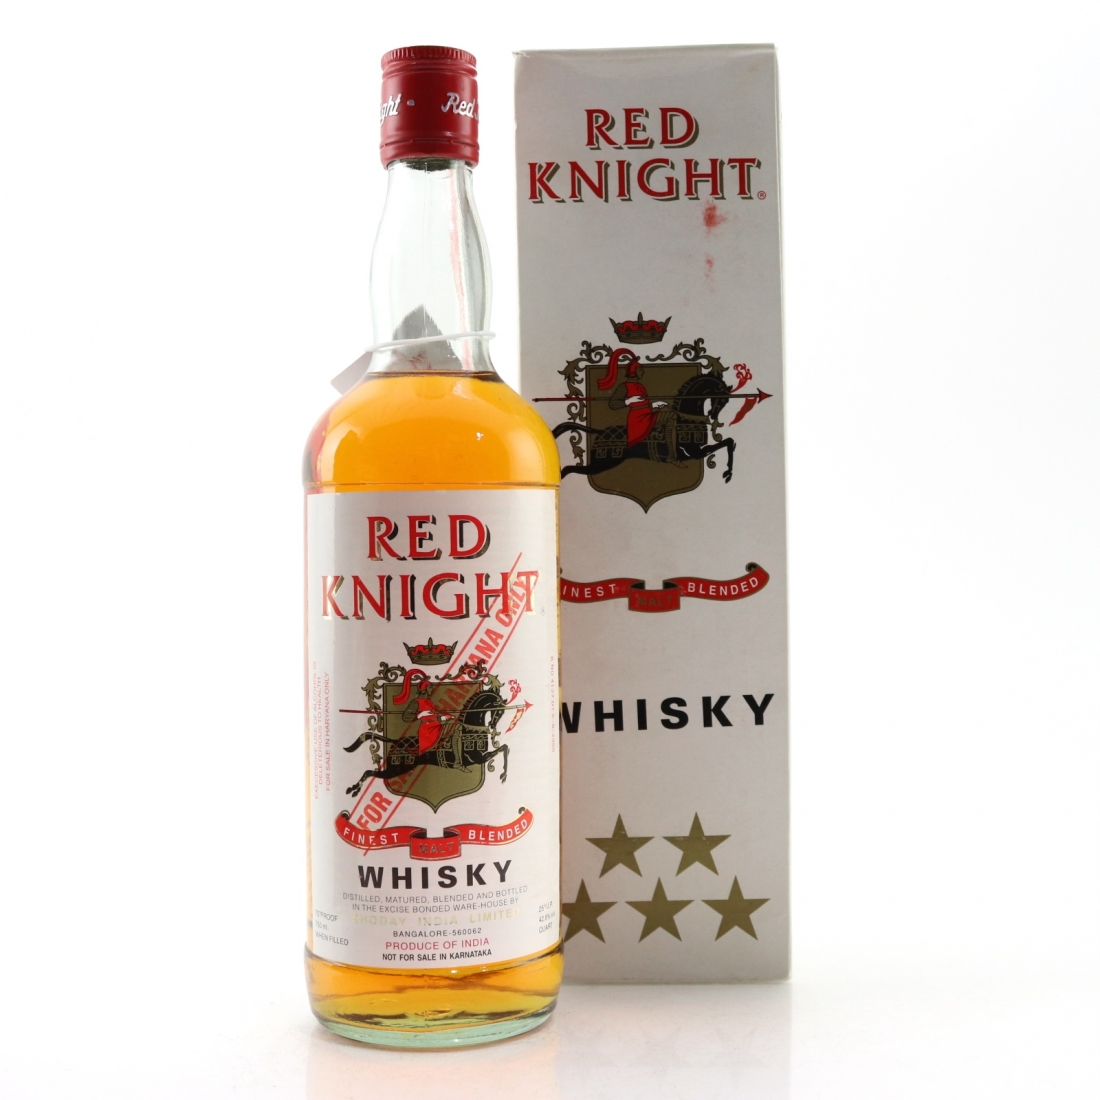 Red Knight Indian Blended Malt